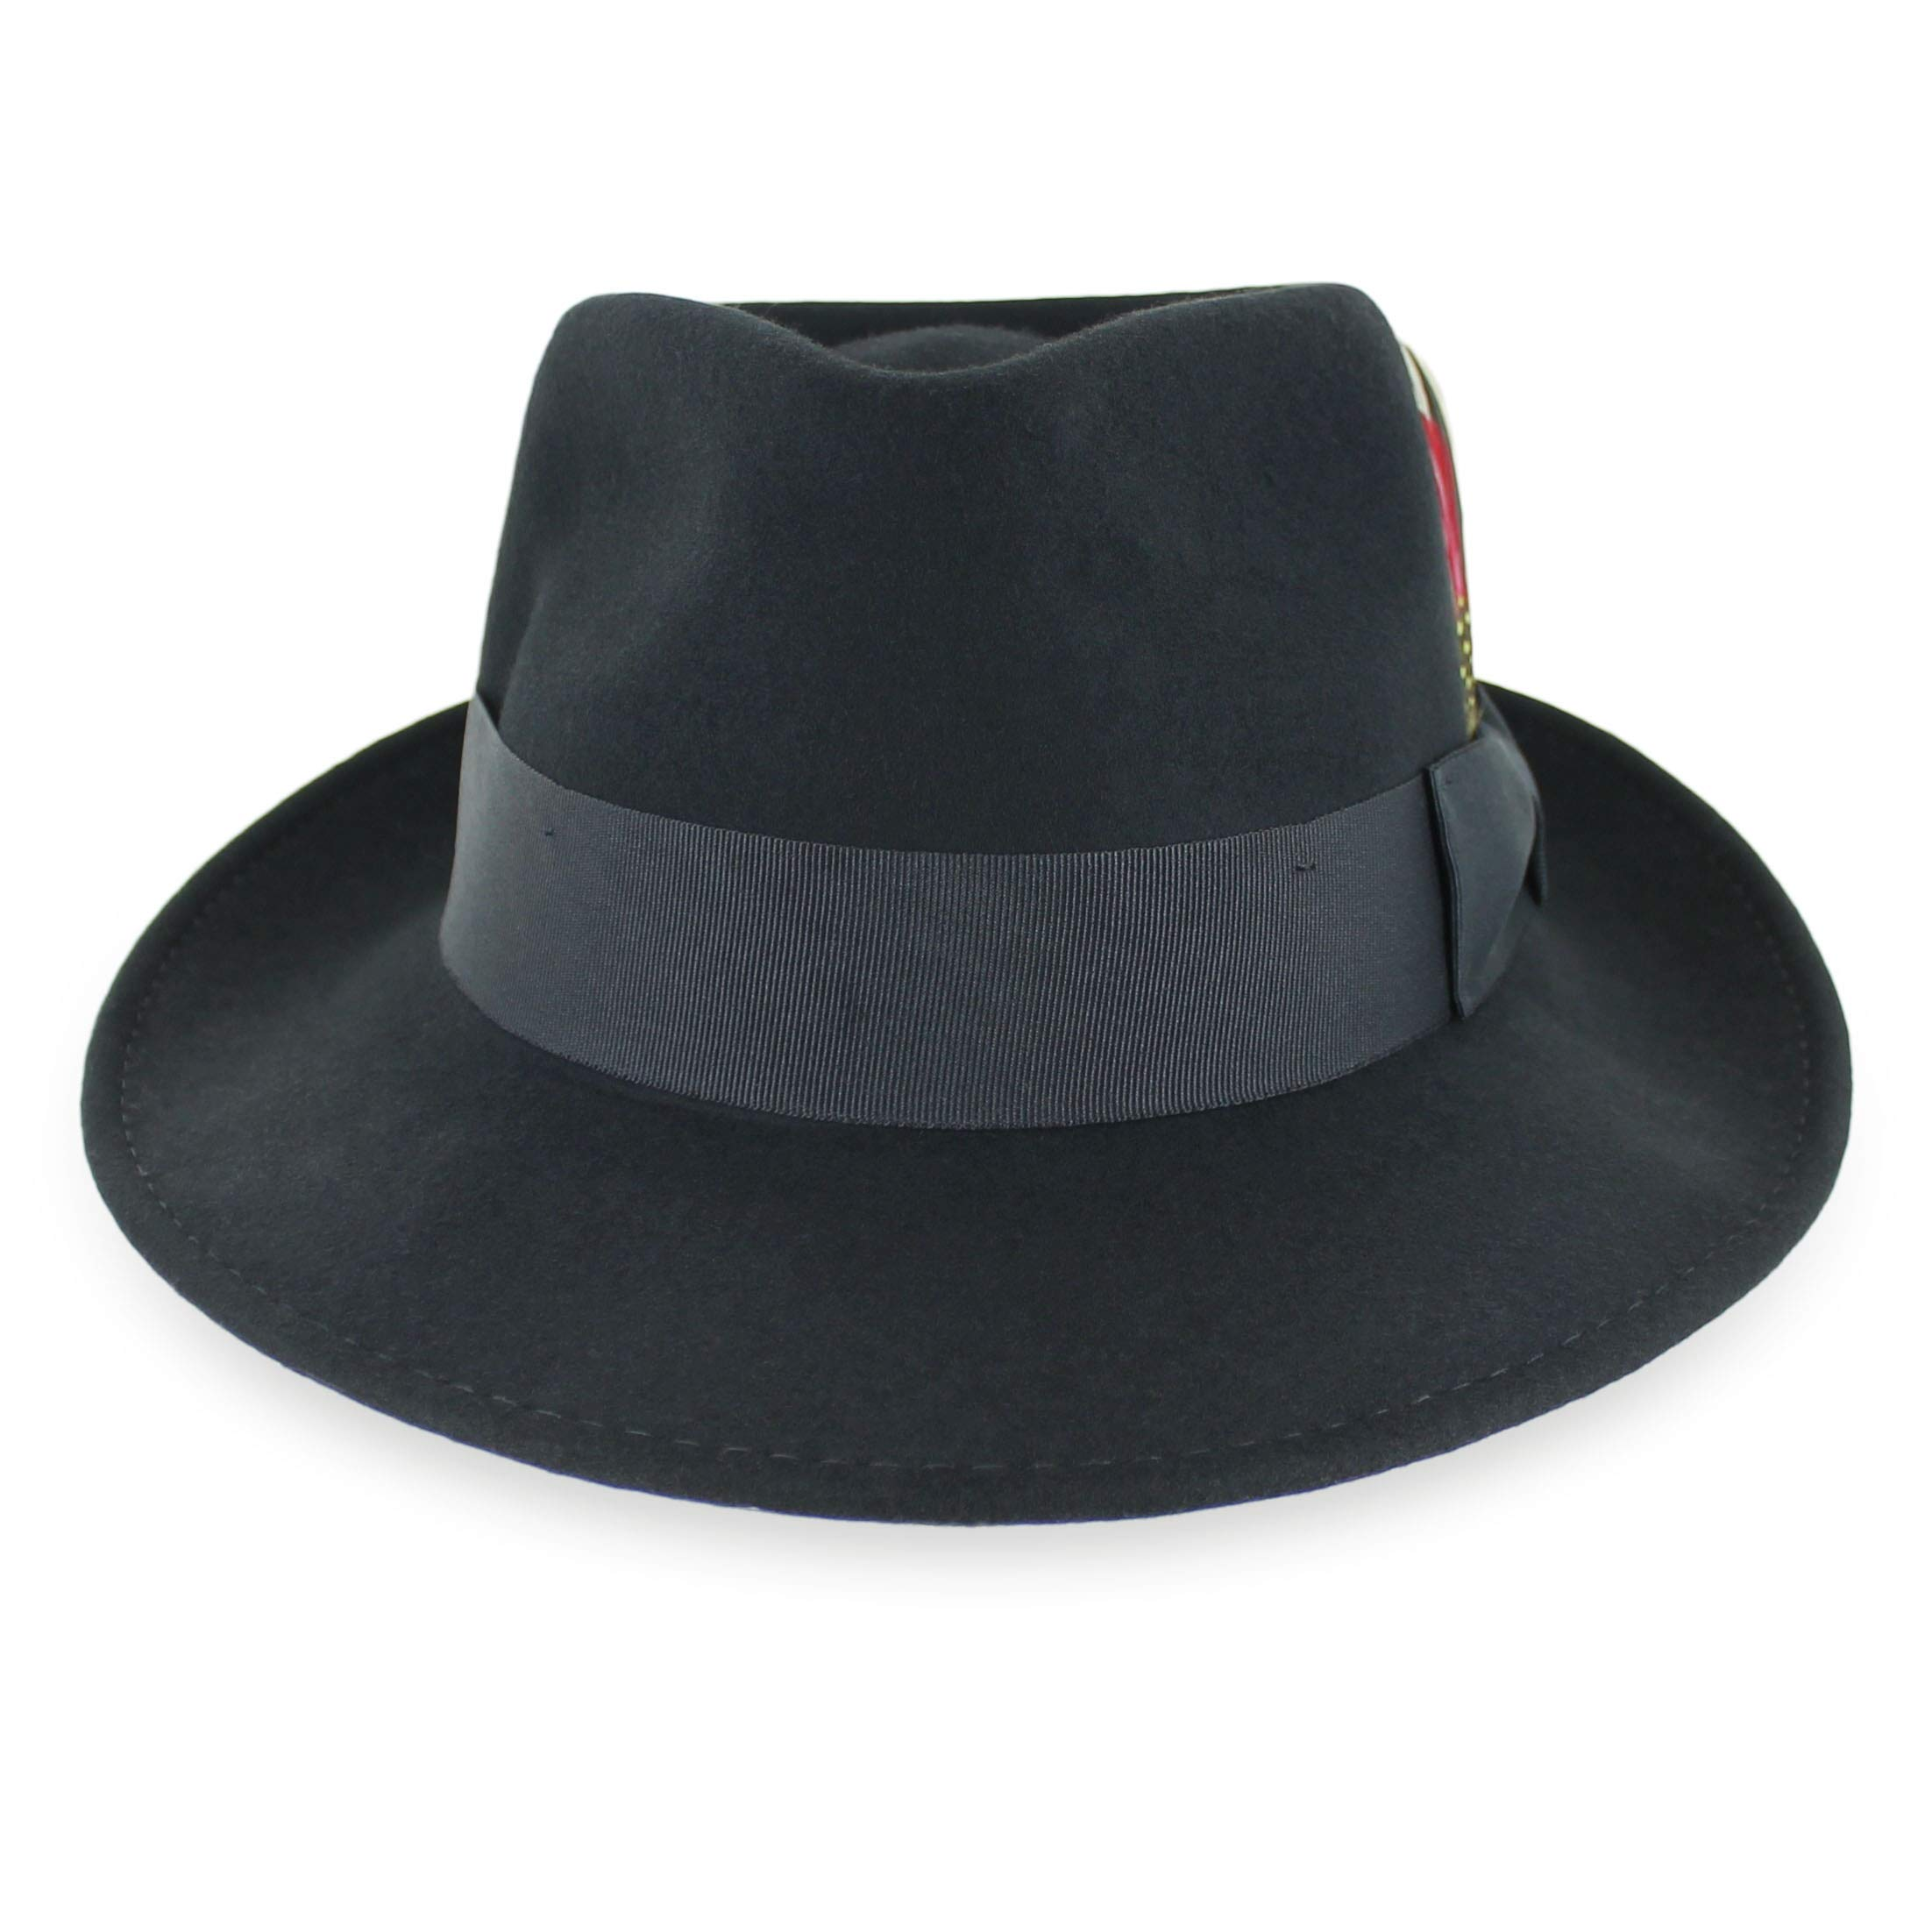 1e64b56195df9 Belfry Gangster 100% Wool Stain Resistant Crushable Dress Fedora in Black  Grey Navy Brown Pecan